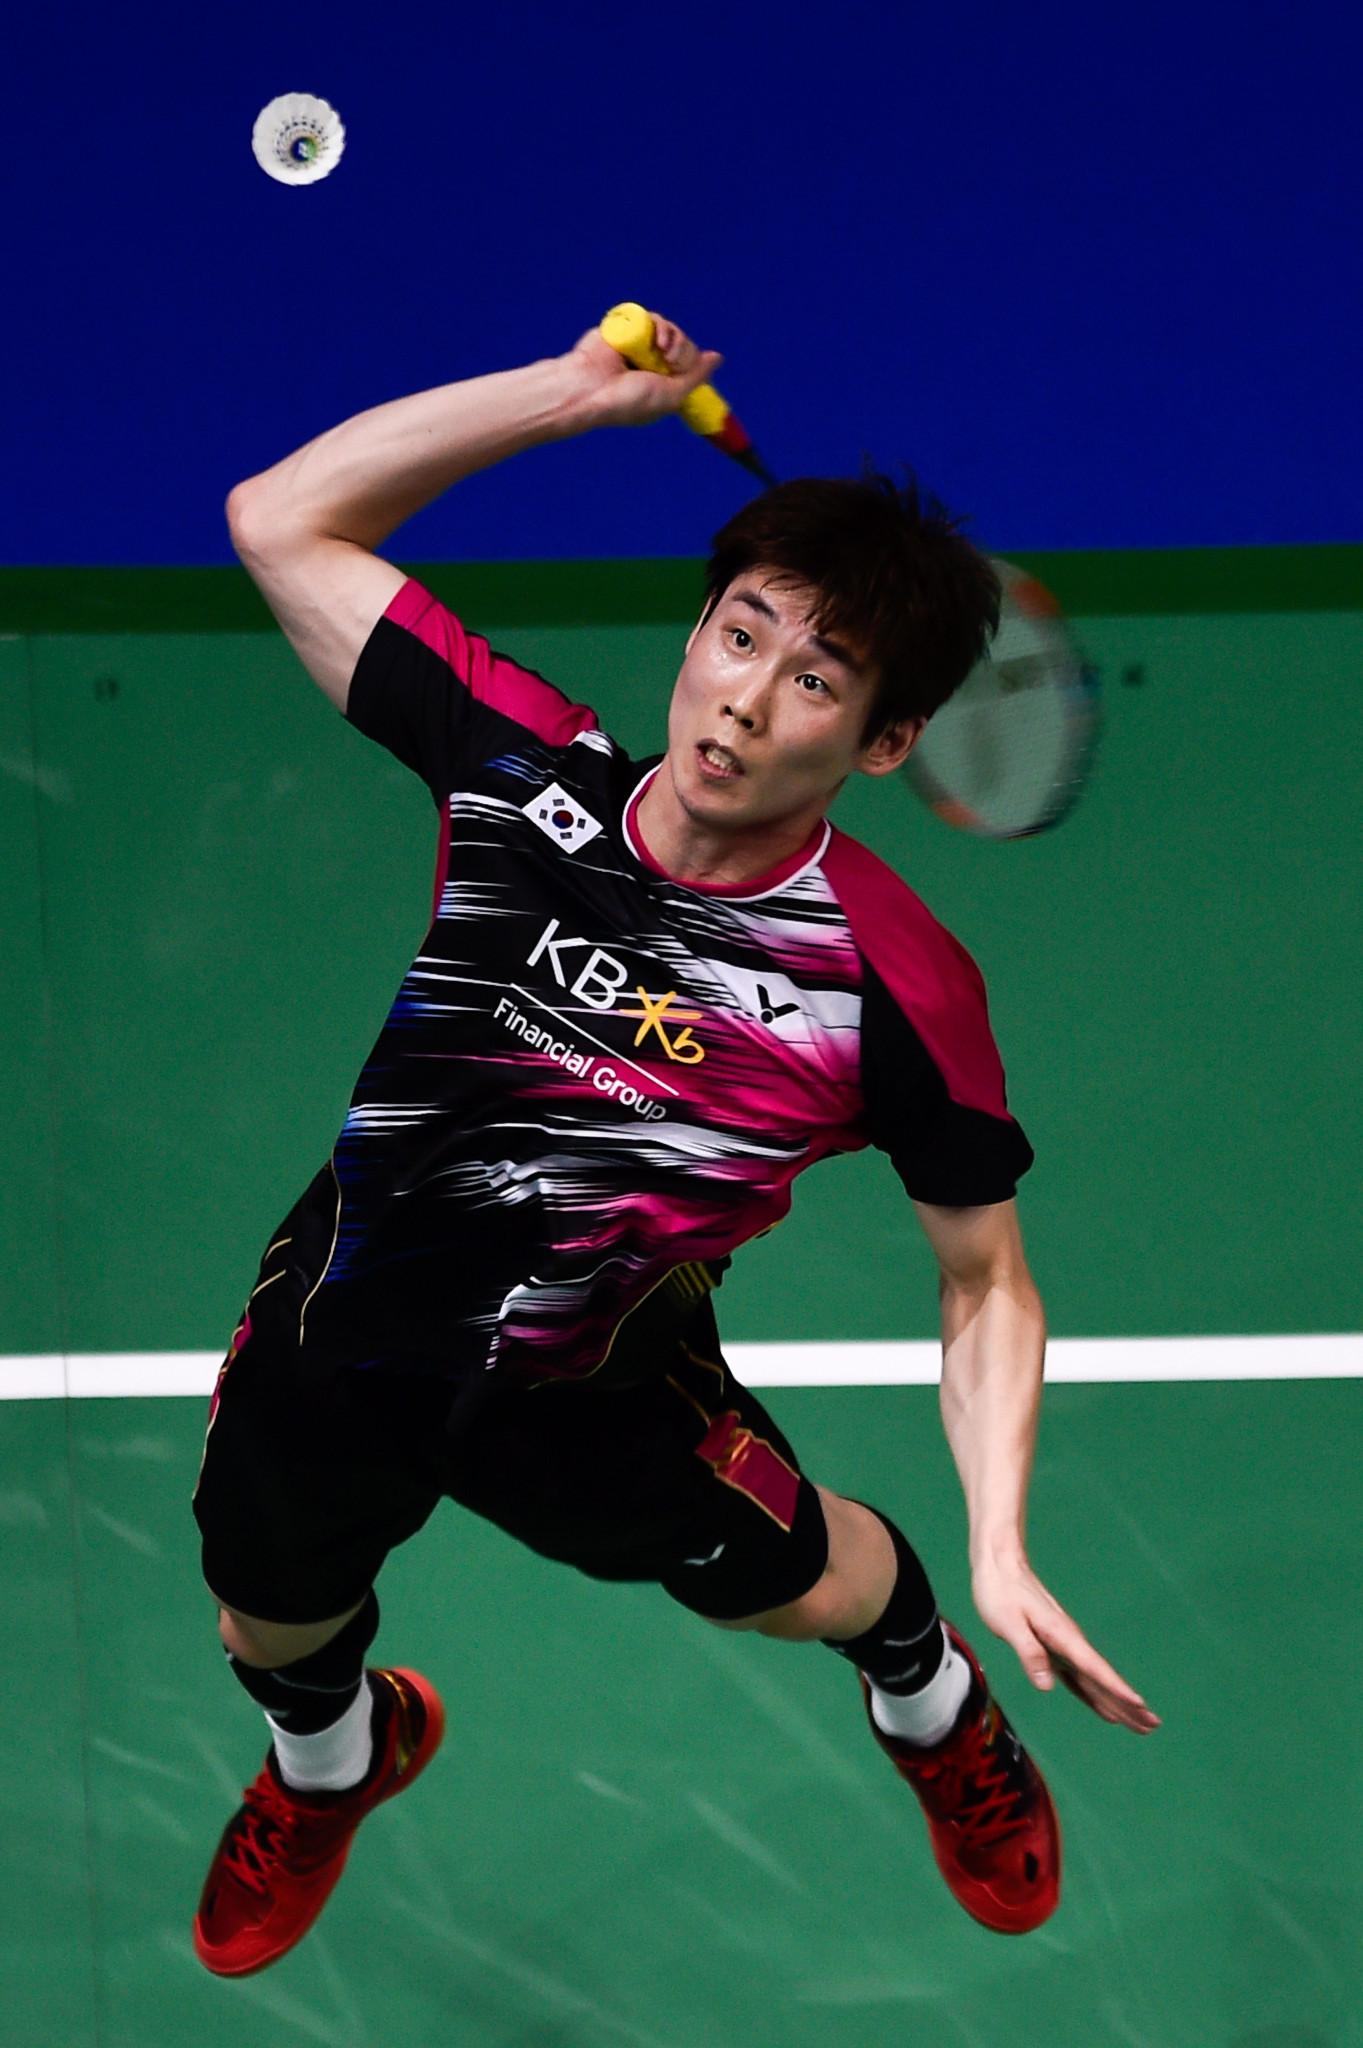 World champion Okuhara among players to progress at BWF Korea Open